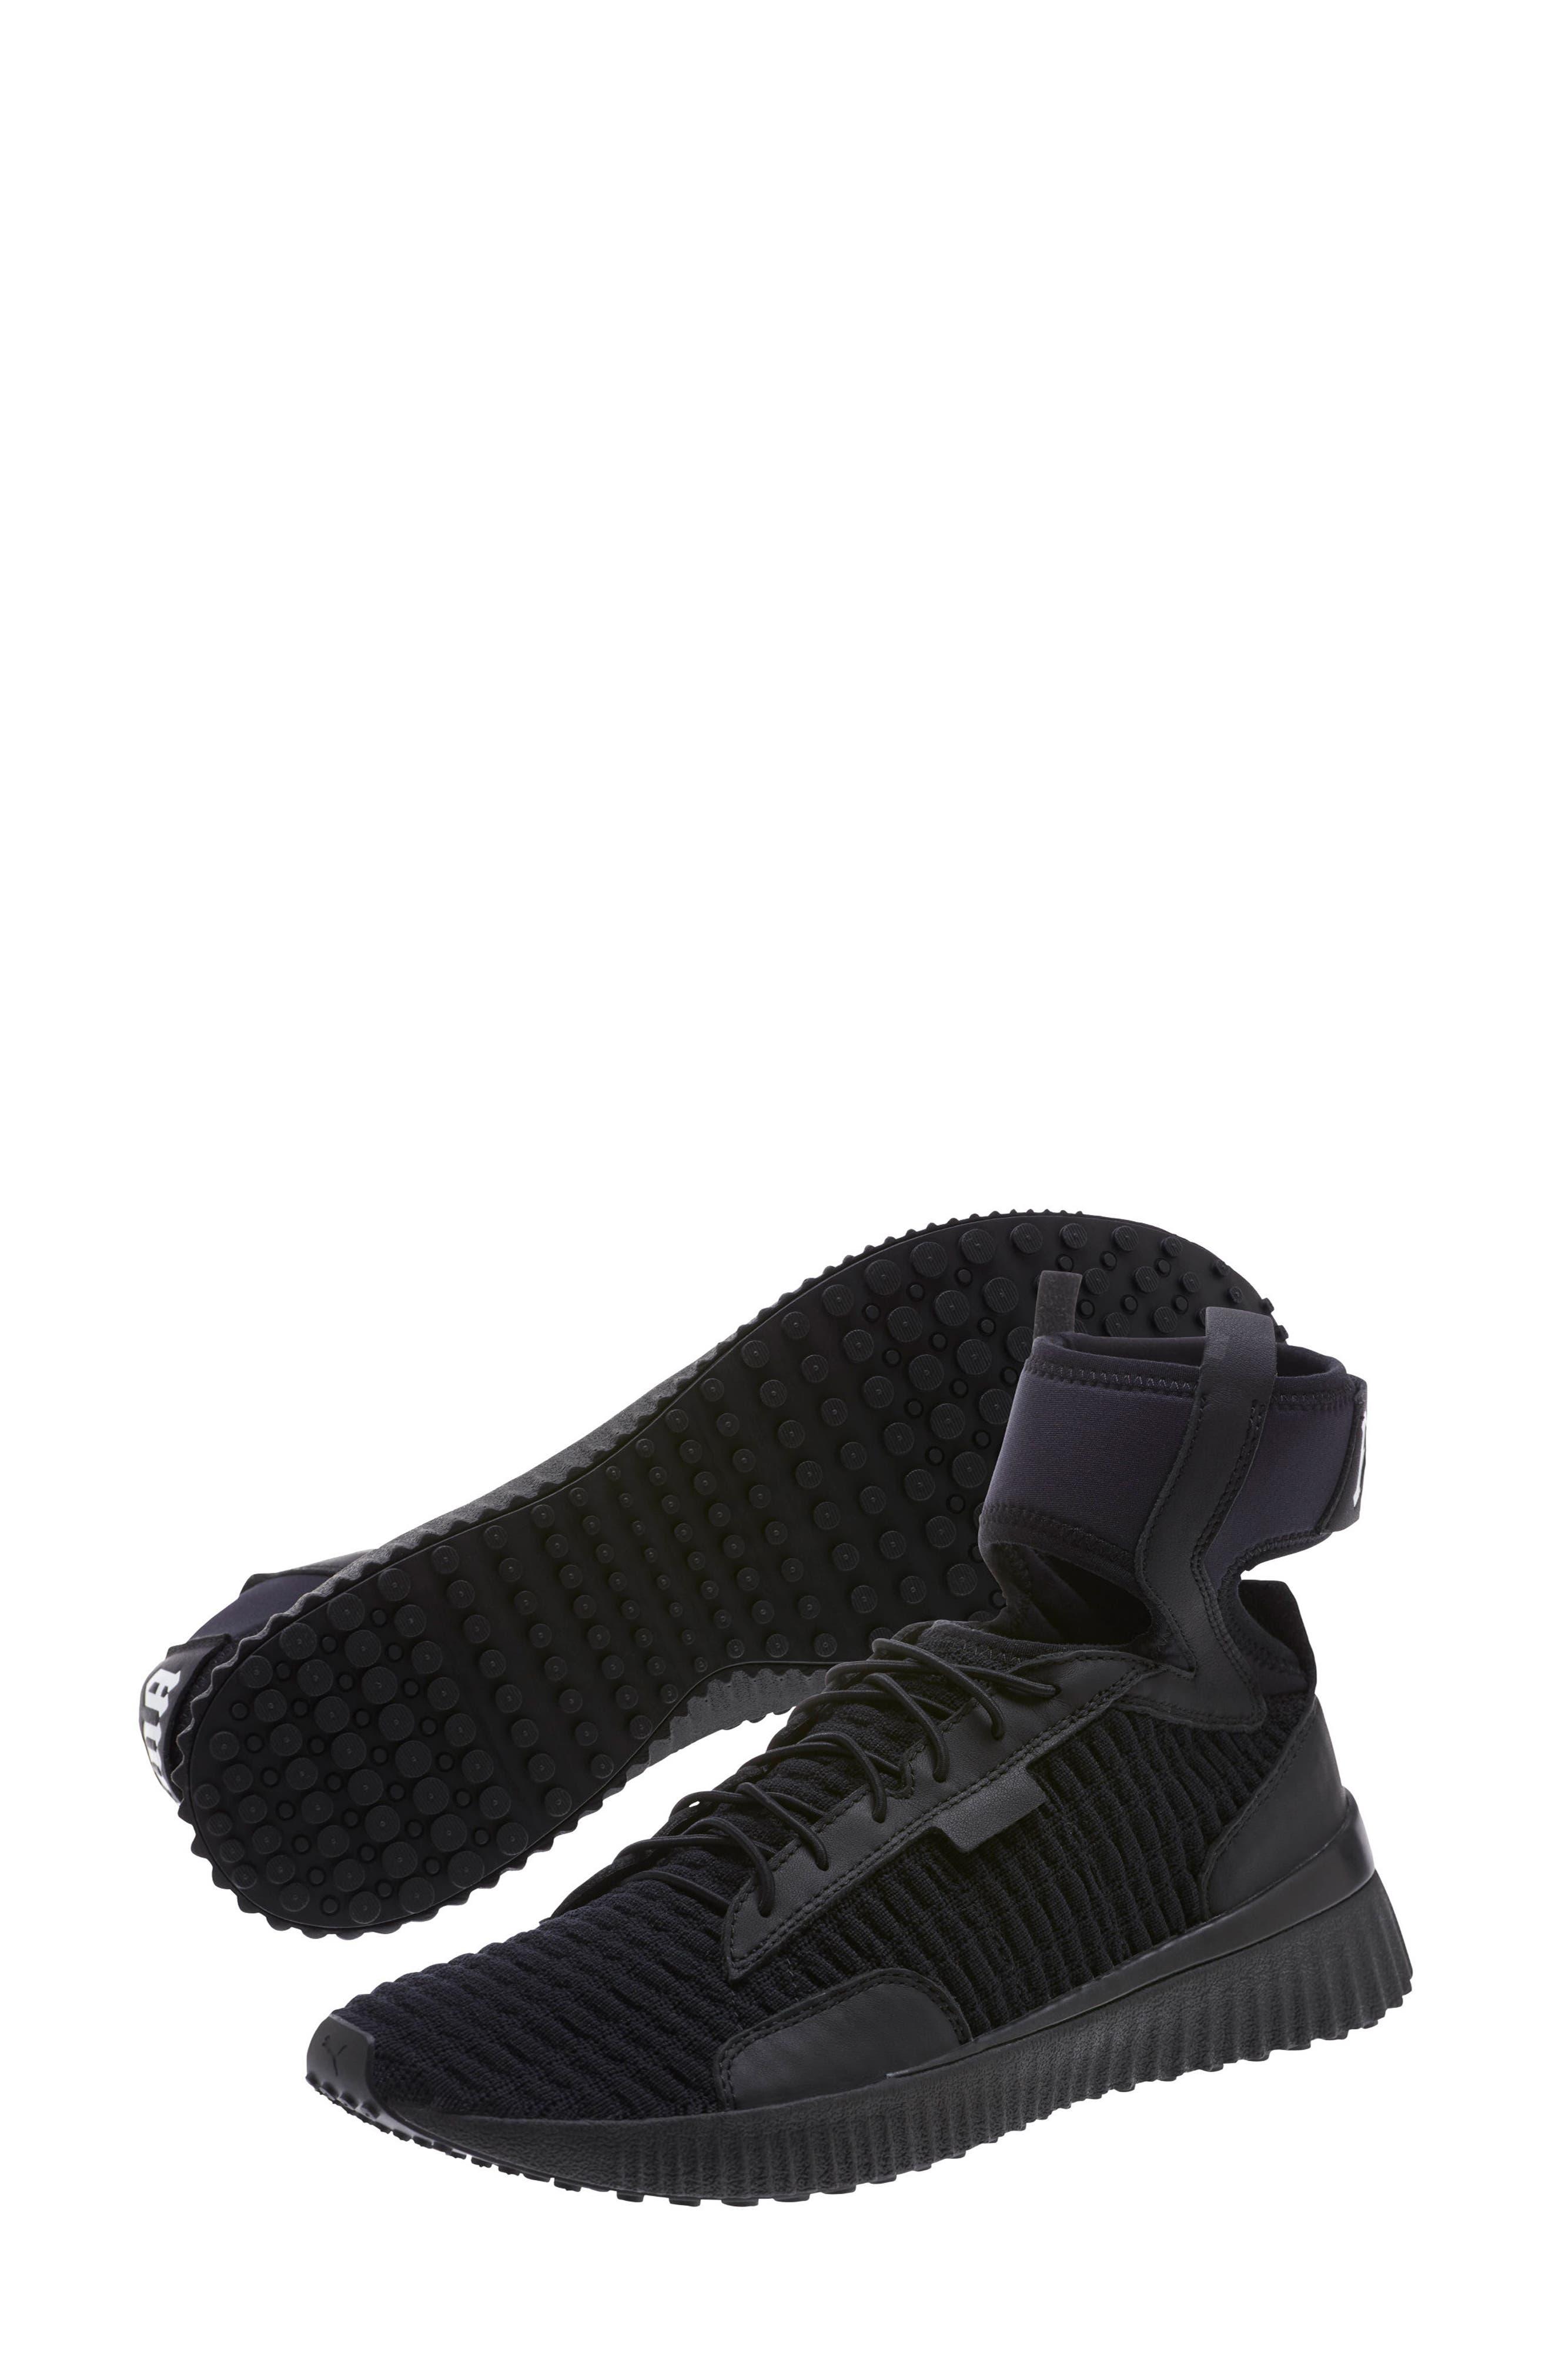 FENTY PUMA by Rihanna High Top Sneaker,                             Alternate thumbnail 7, color,                             001